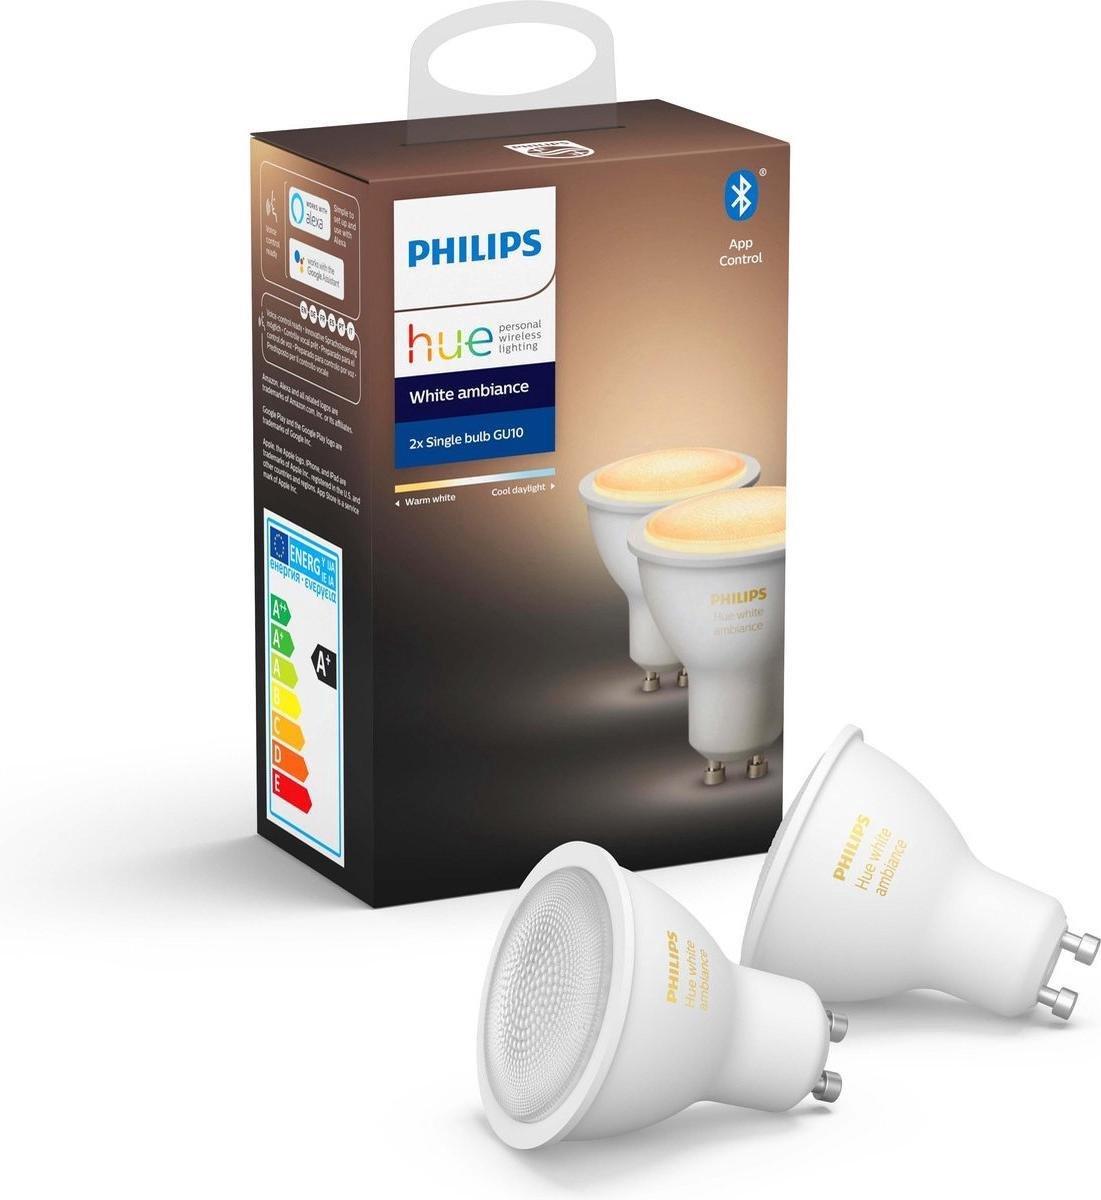 PHILIPS HUE - LED Spot Set GU10 - White Ambiance - Bluetooth - Pragmi Zano Pro - Inbouw Rond - Mat Zwart/Goud - Kantelbaar - Ø93mm